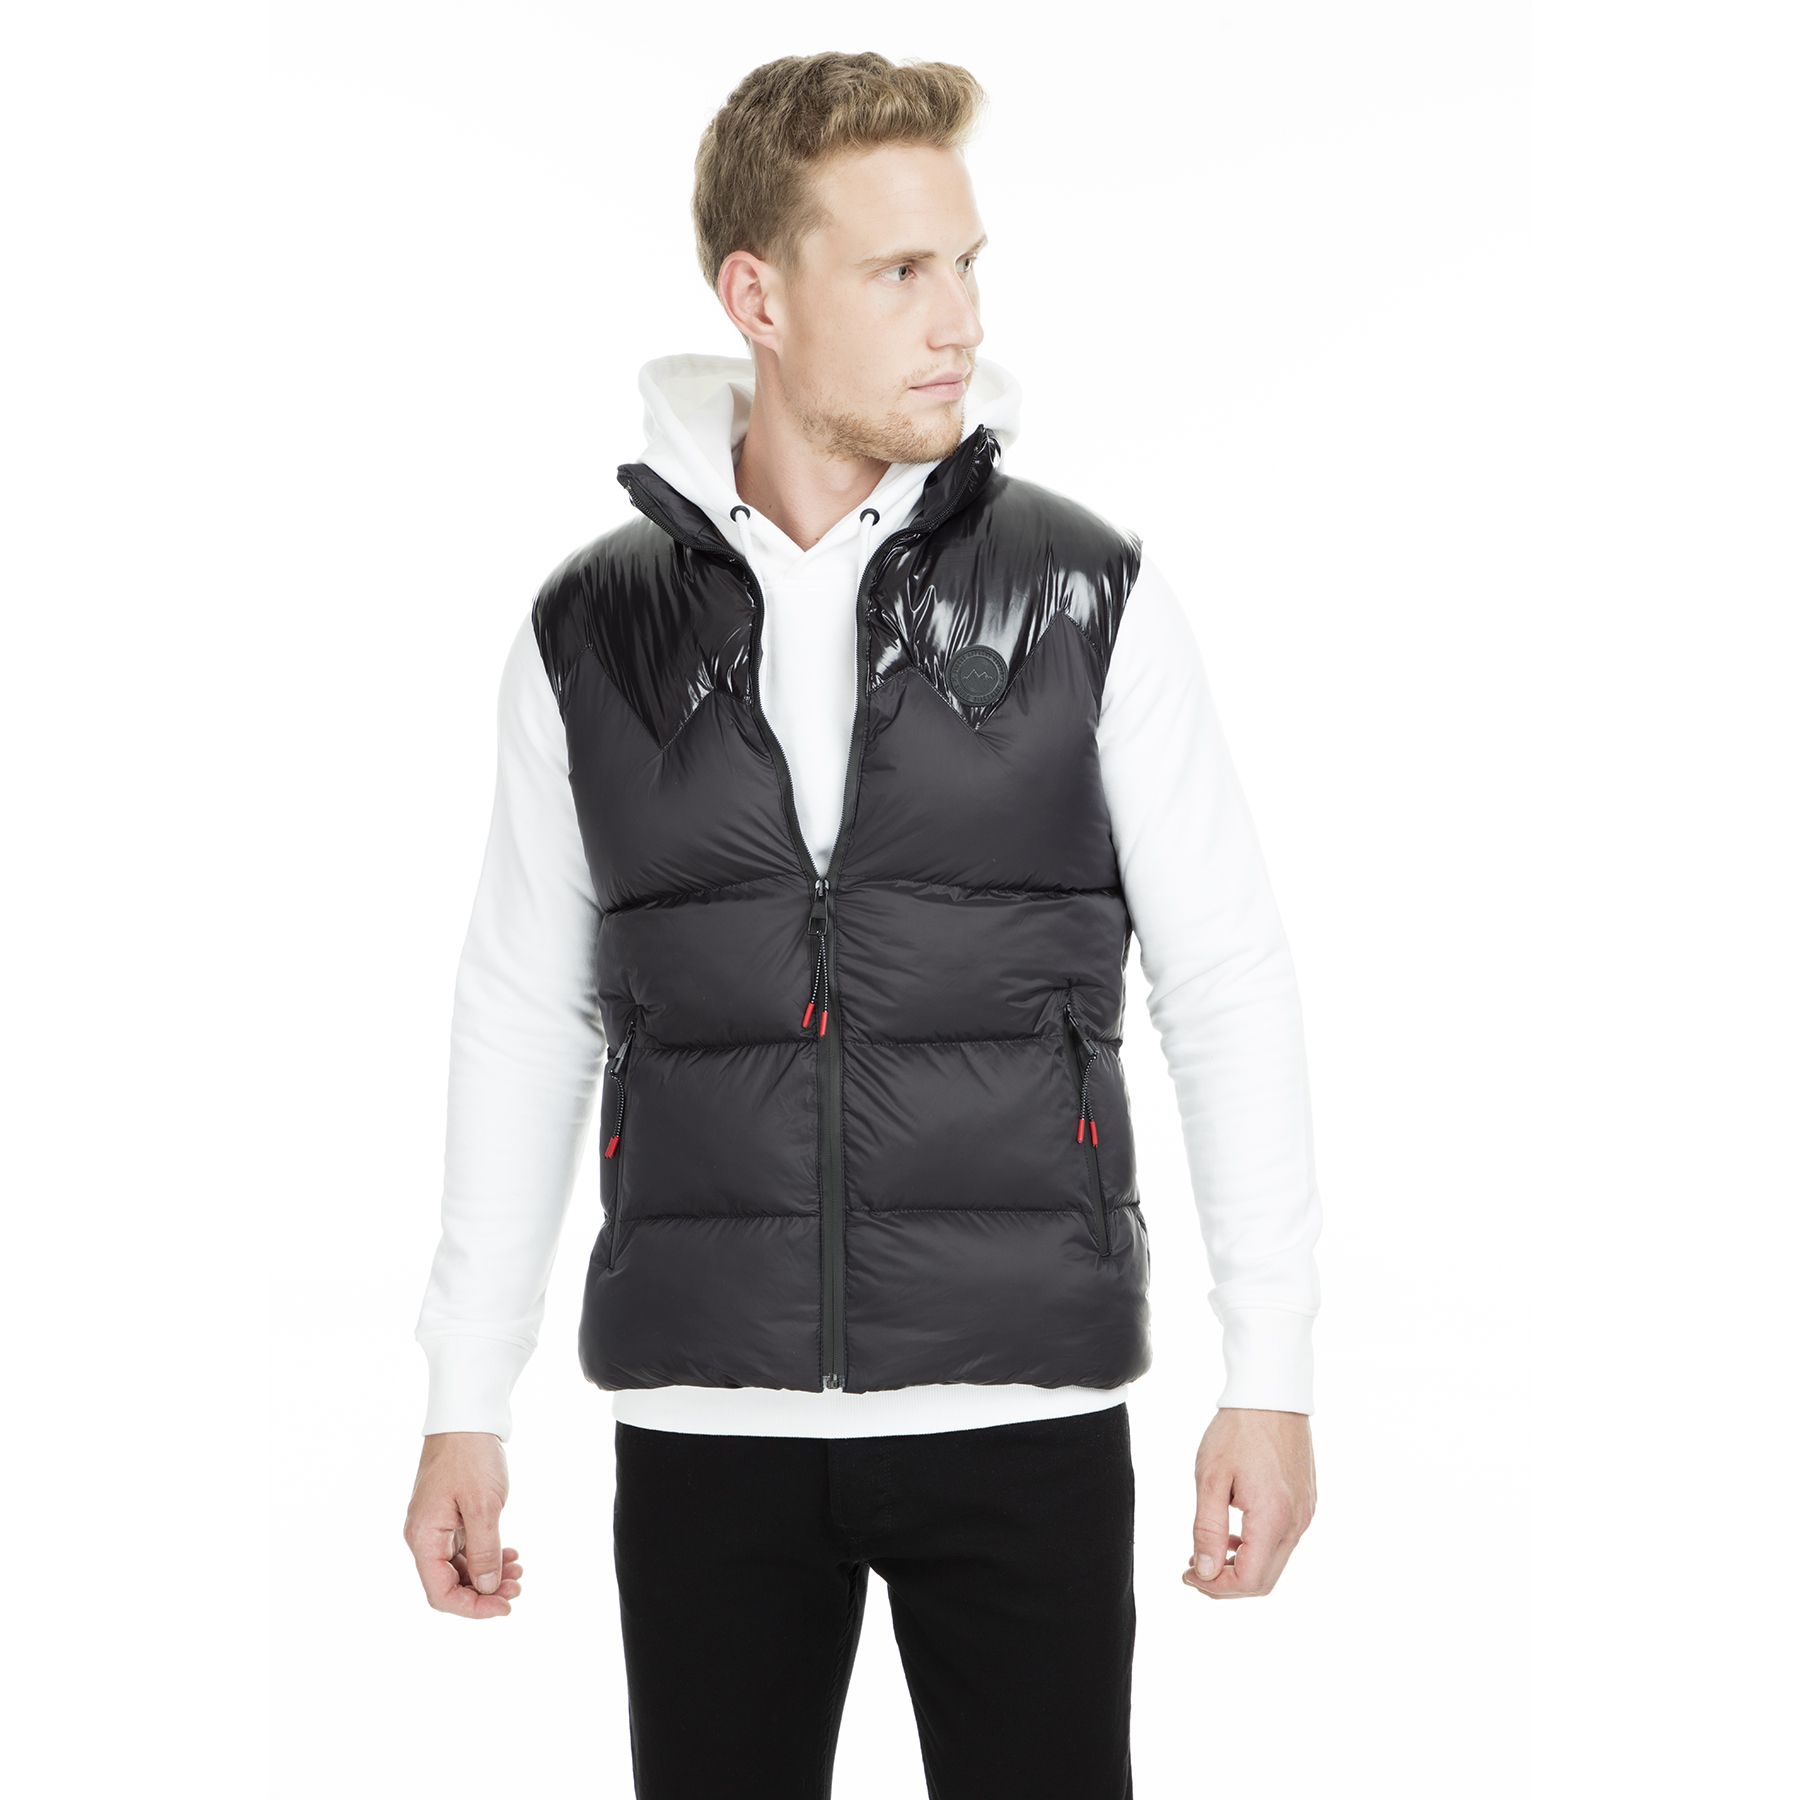 Buratti Inflatable Vest MALE VEST 528ASTRA